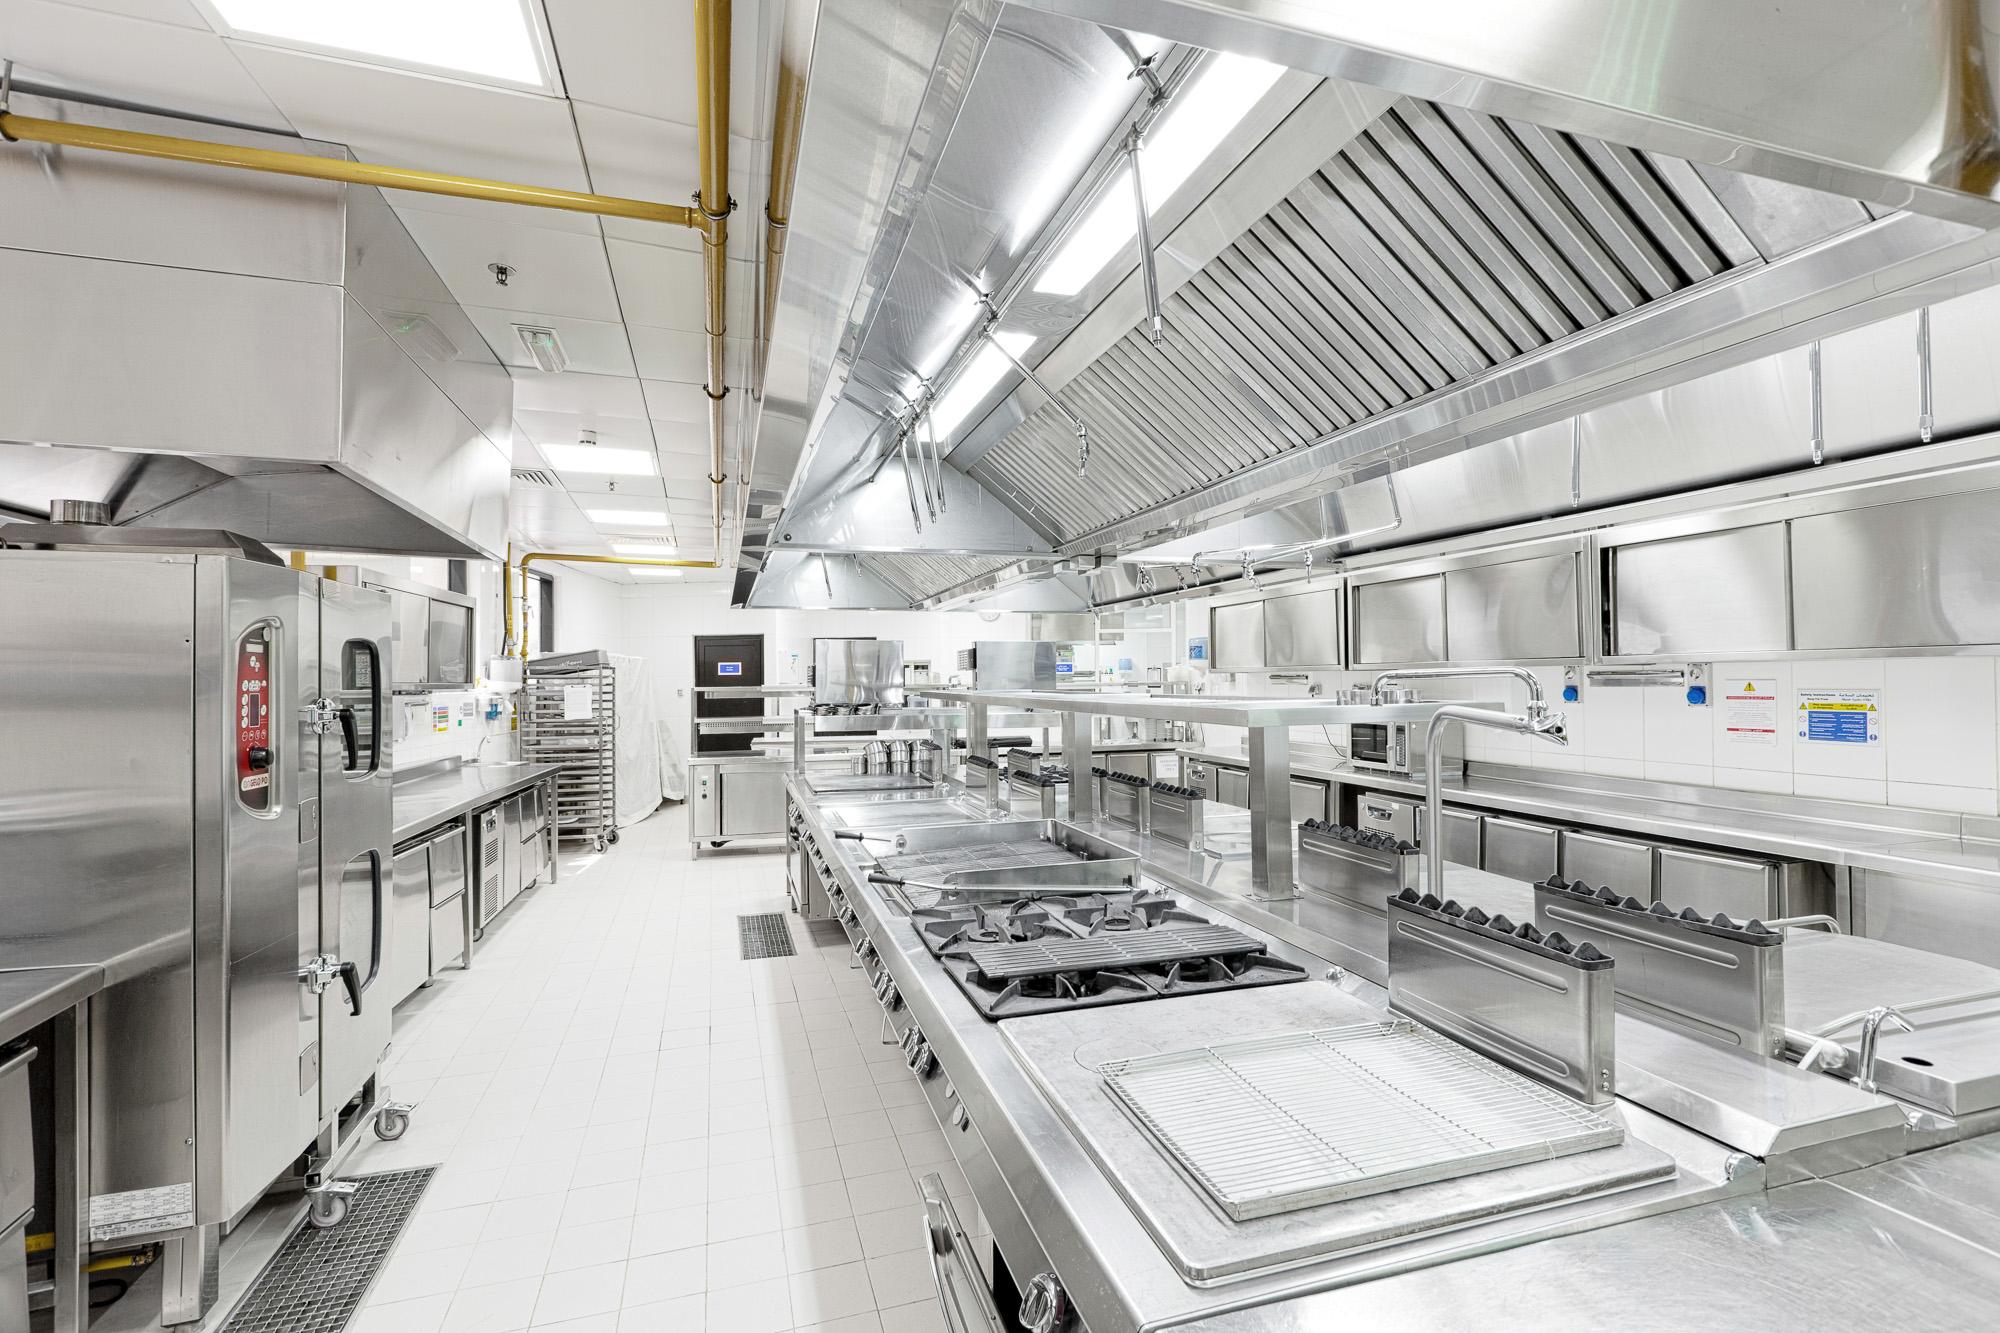 Italia_kitchen_-le_meridien_r-9